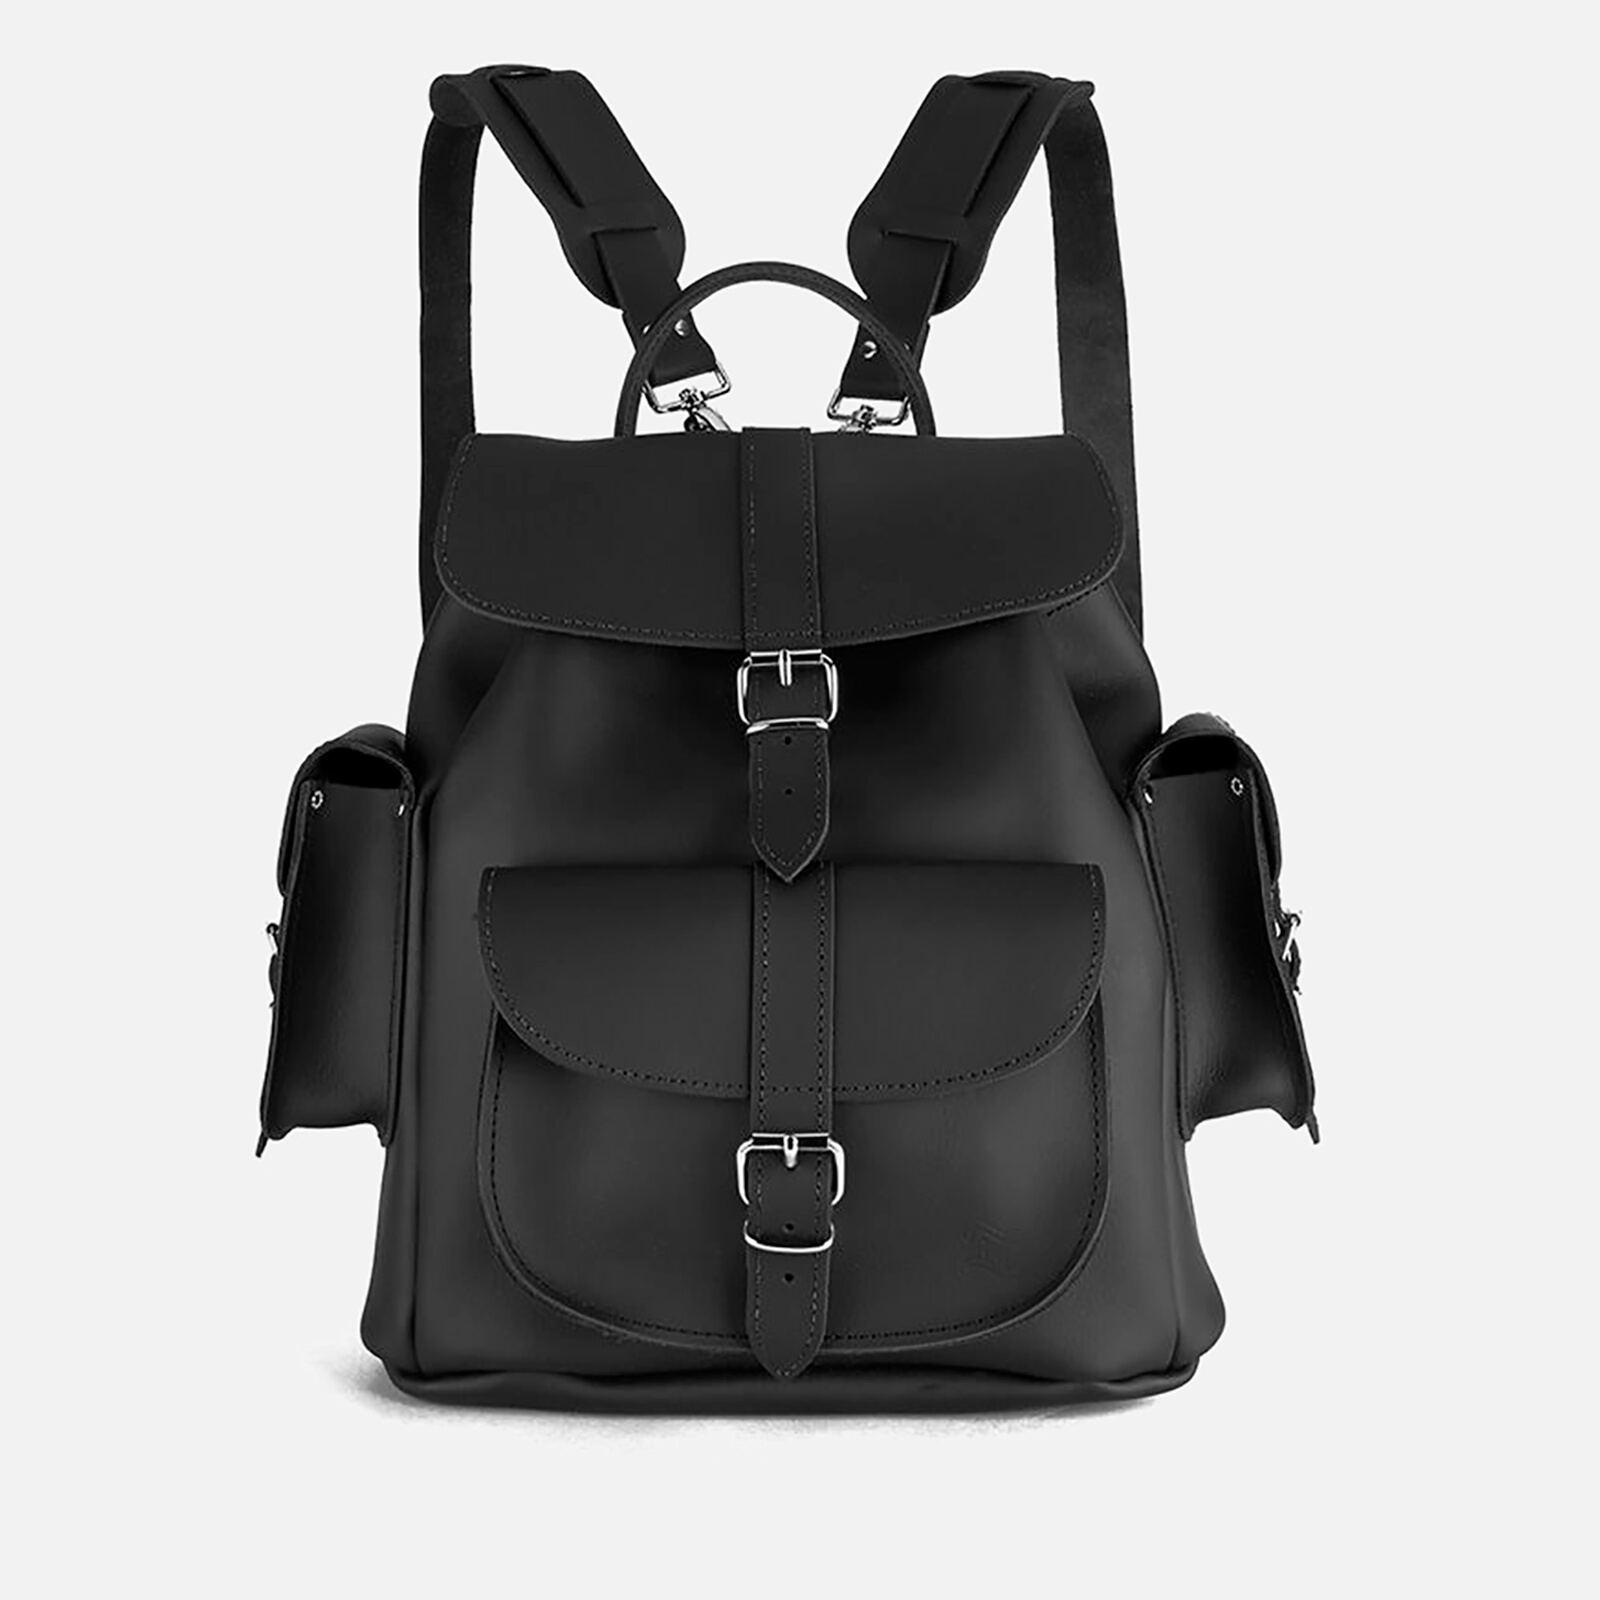 7906f56ed00d Grafea Show Business Medium Leather Rucksack - Black